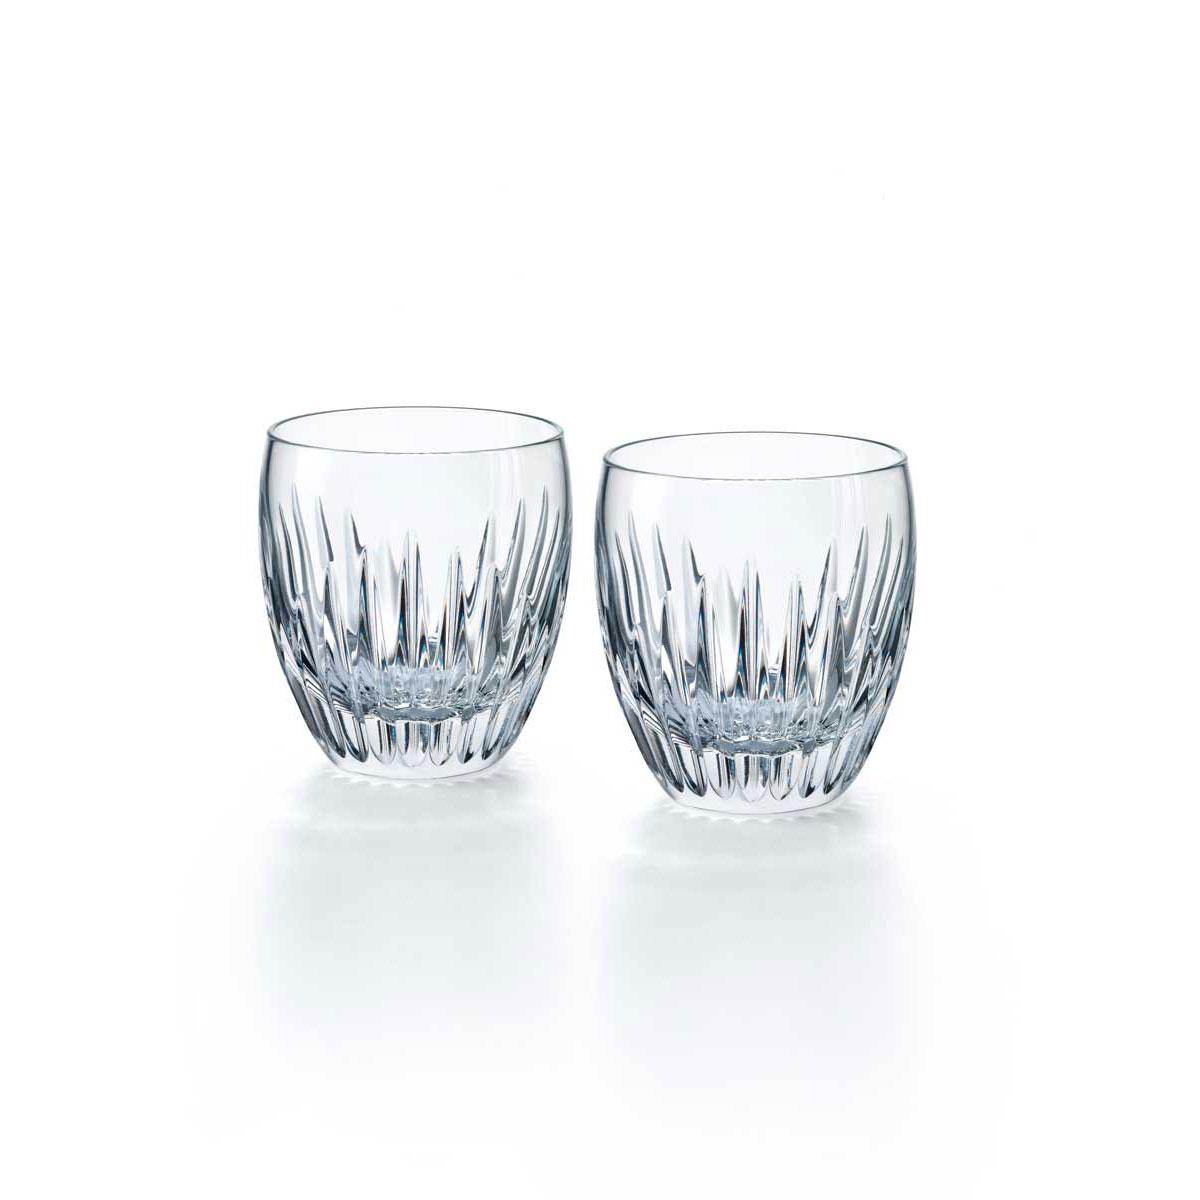 Baccarat Crystal, Massena Tumbler, Pair